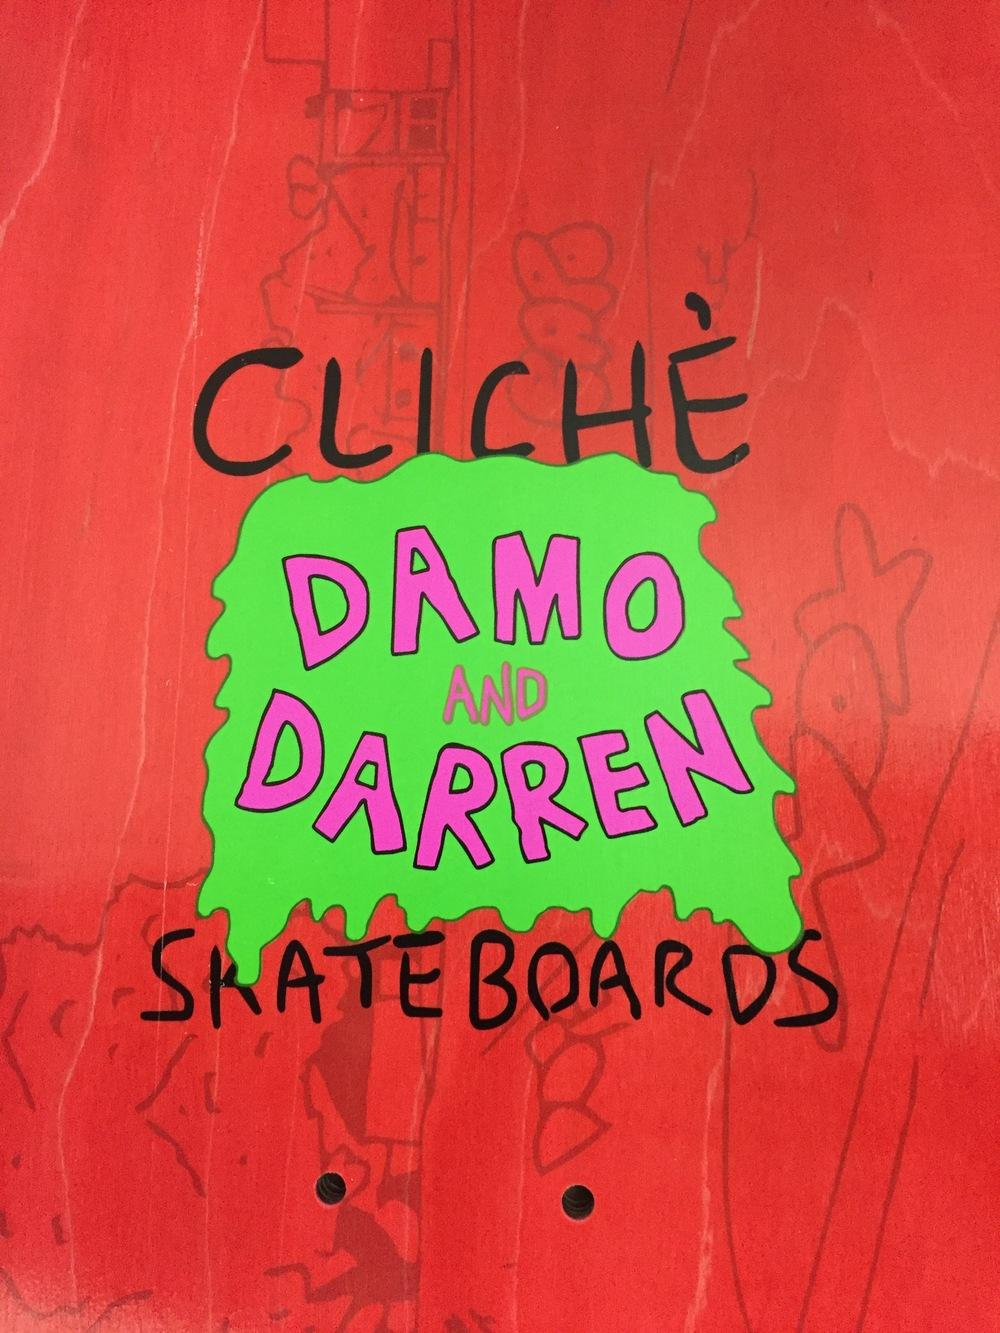 Cliché Skateboards x Damo & Darren Collab 2